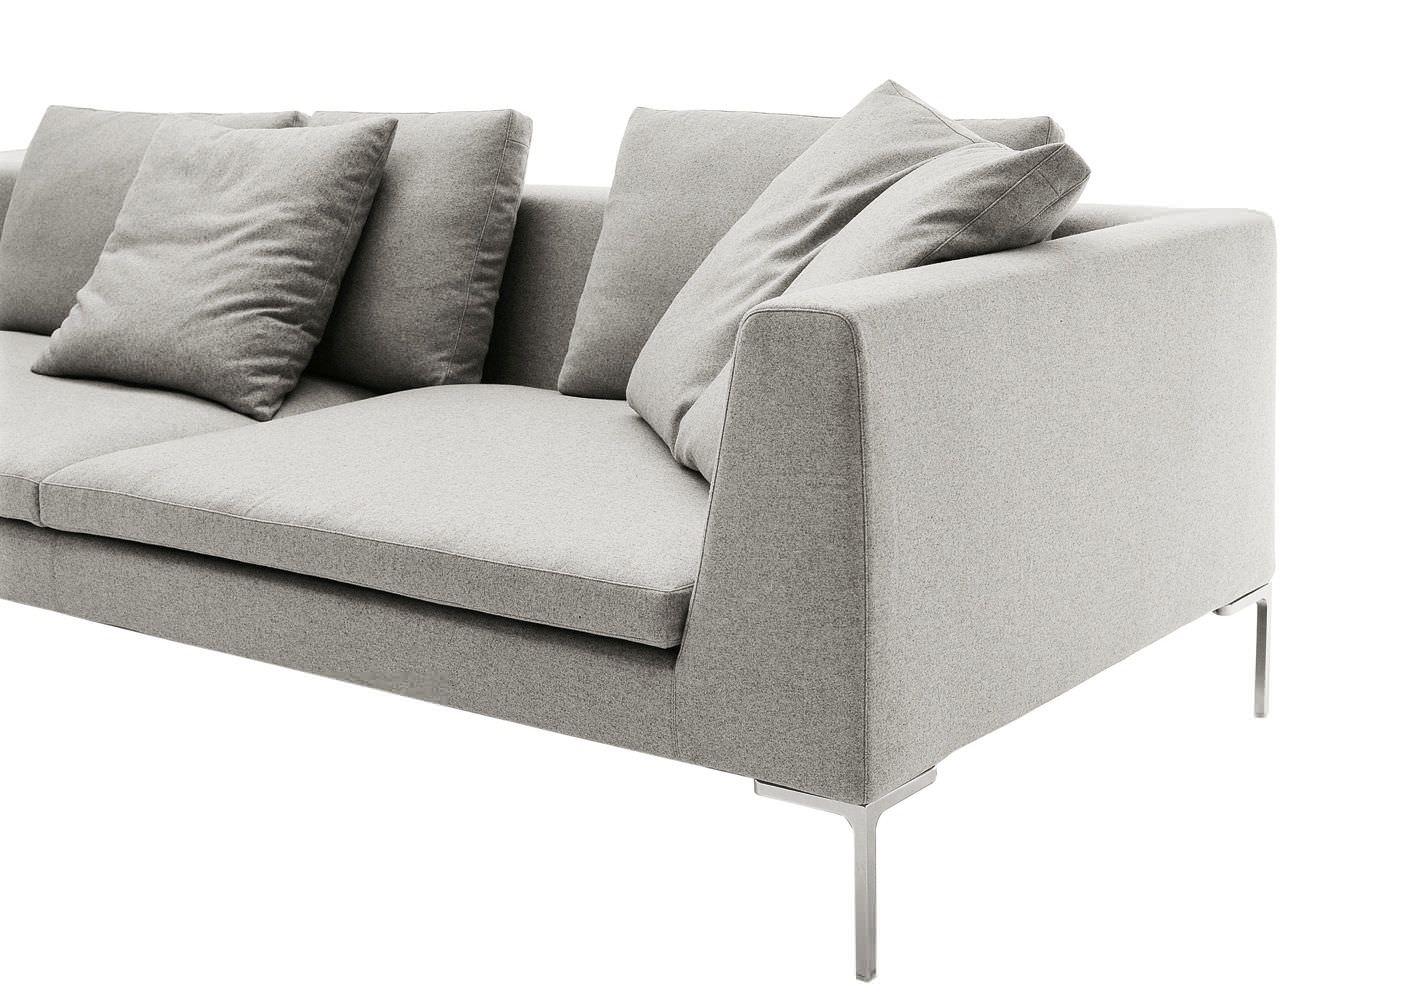 modular sofa contemporary leather fabric charles large bb italia furniture prices